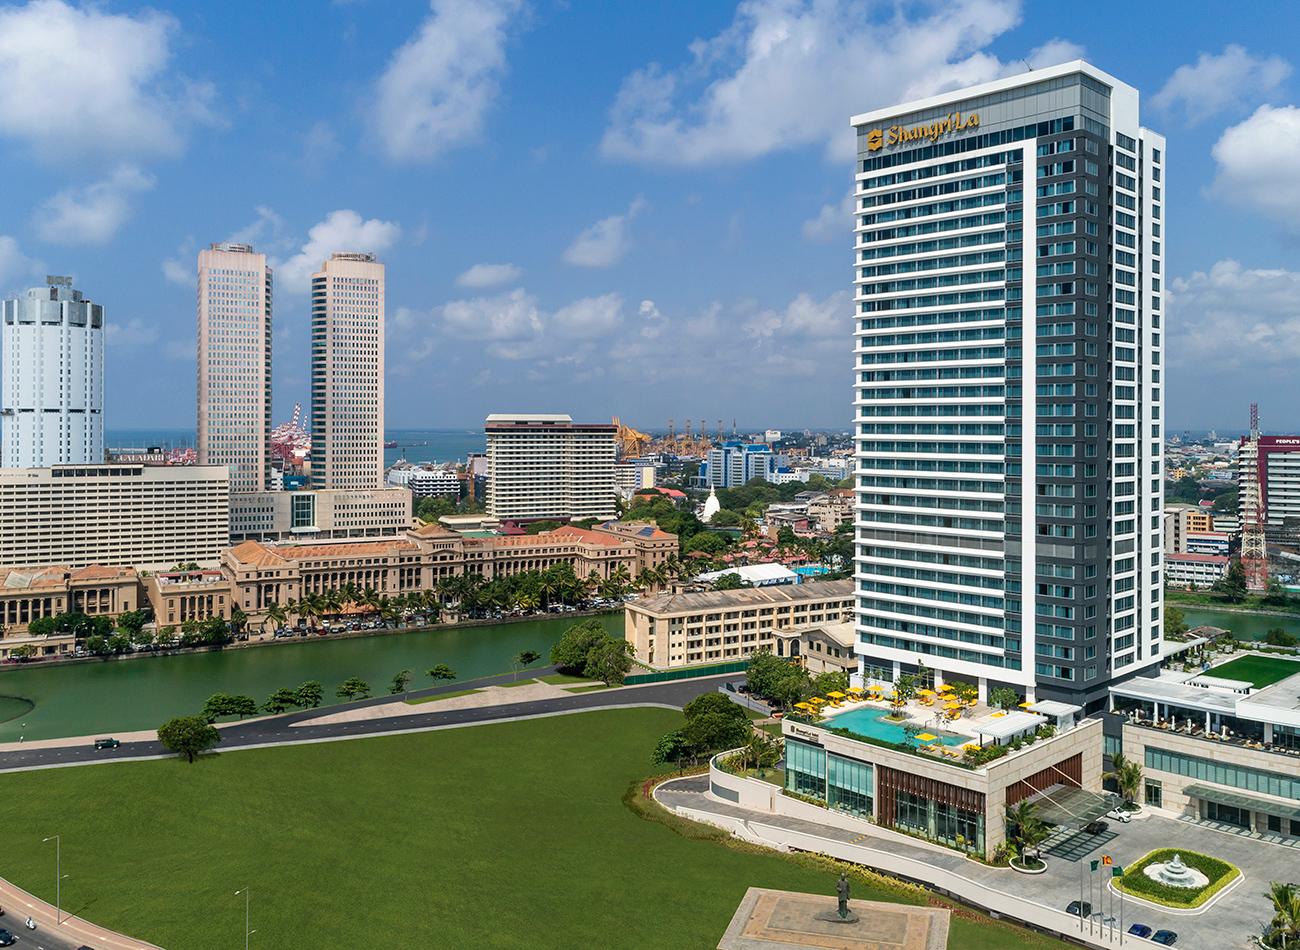 Explosions rock several five-star hotels in Sri Lanka